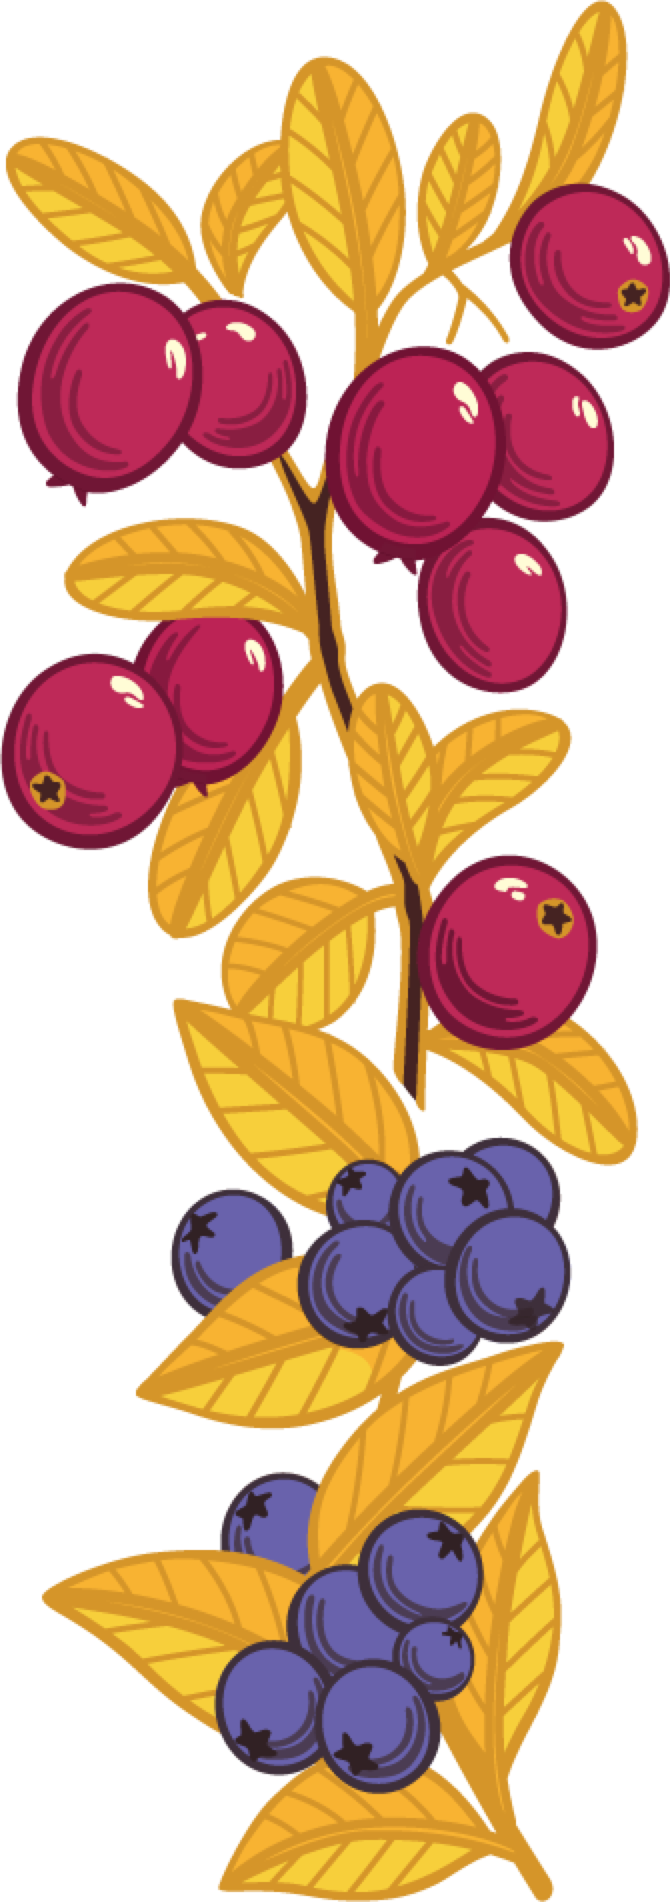 Fruits grains country harvest. Grain clipart dry fruit